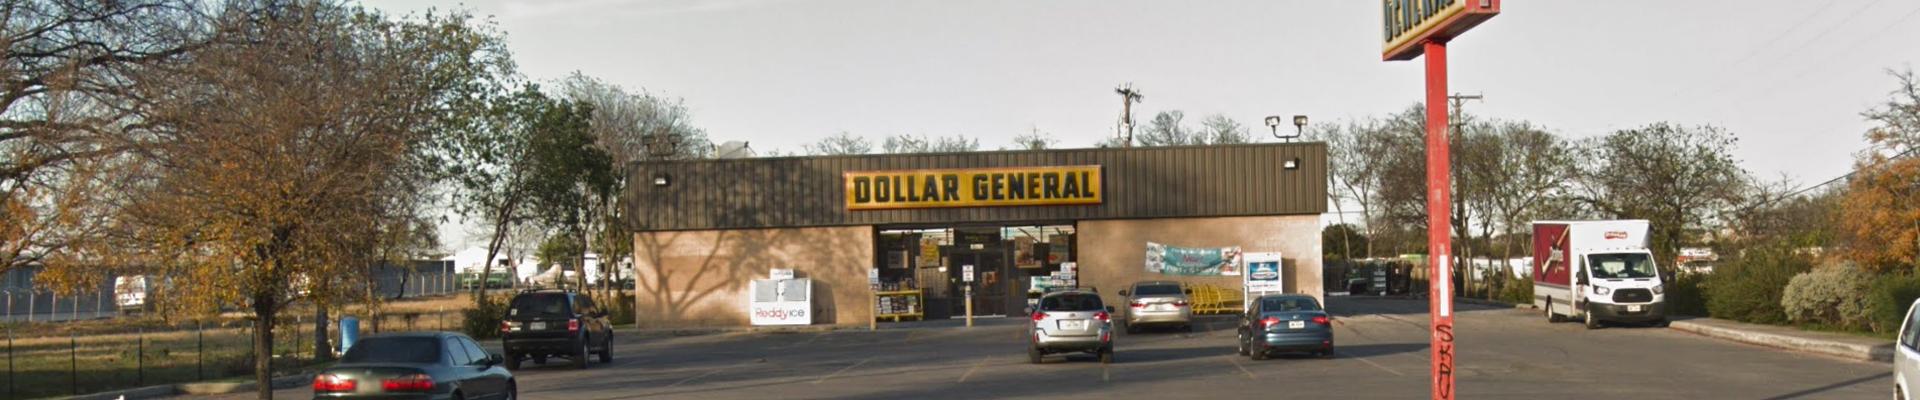 Dollar General (9846) – San Antonio, Texas